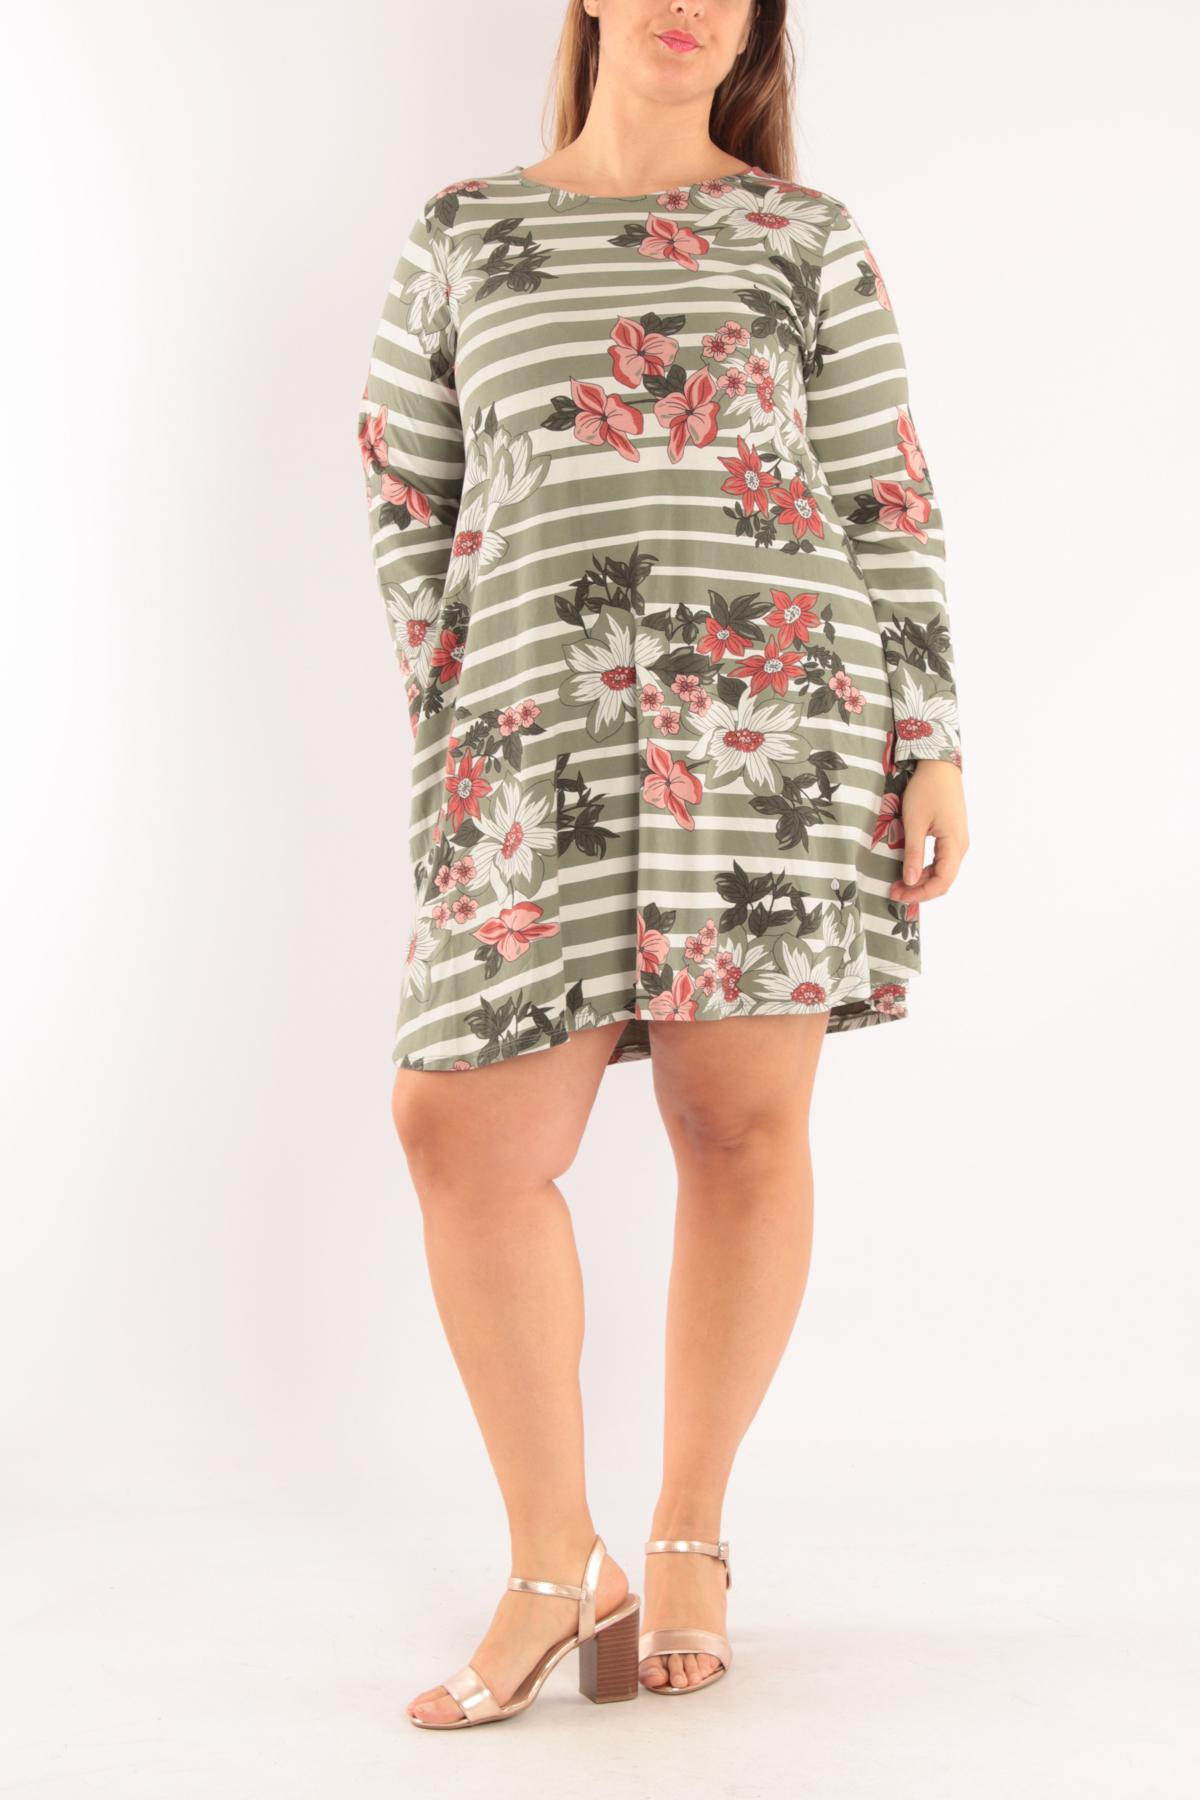 Robes Femme Kaki Ella Kingsley IT3382 #c eFashion Paris